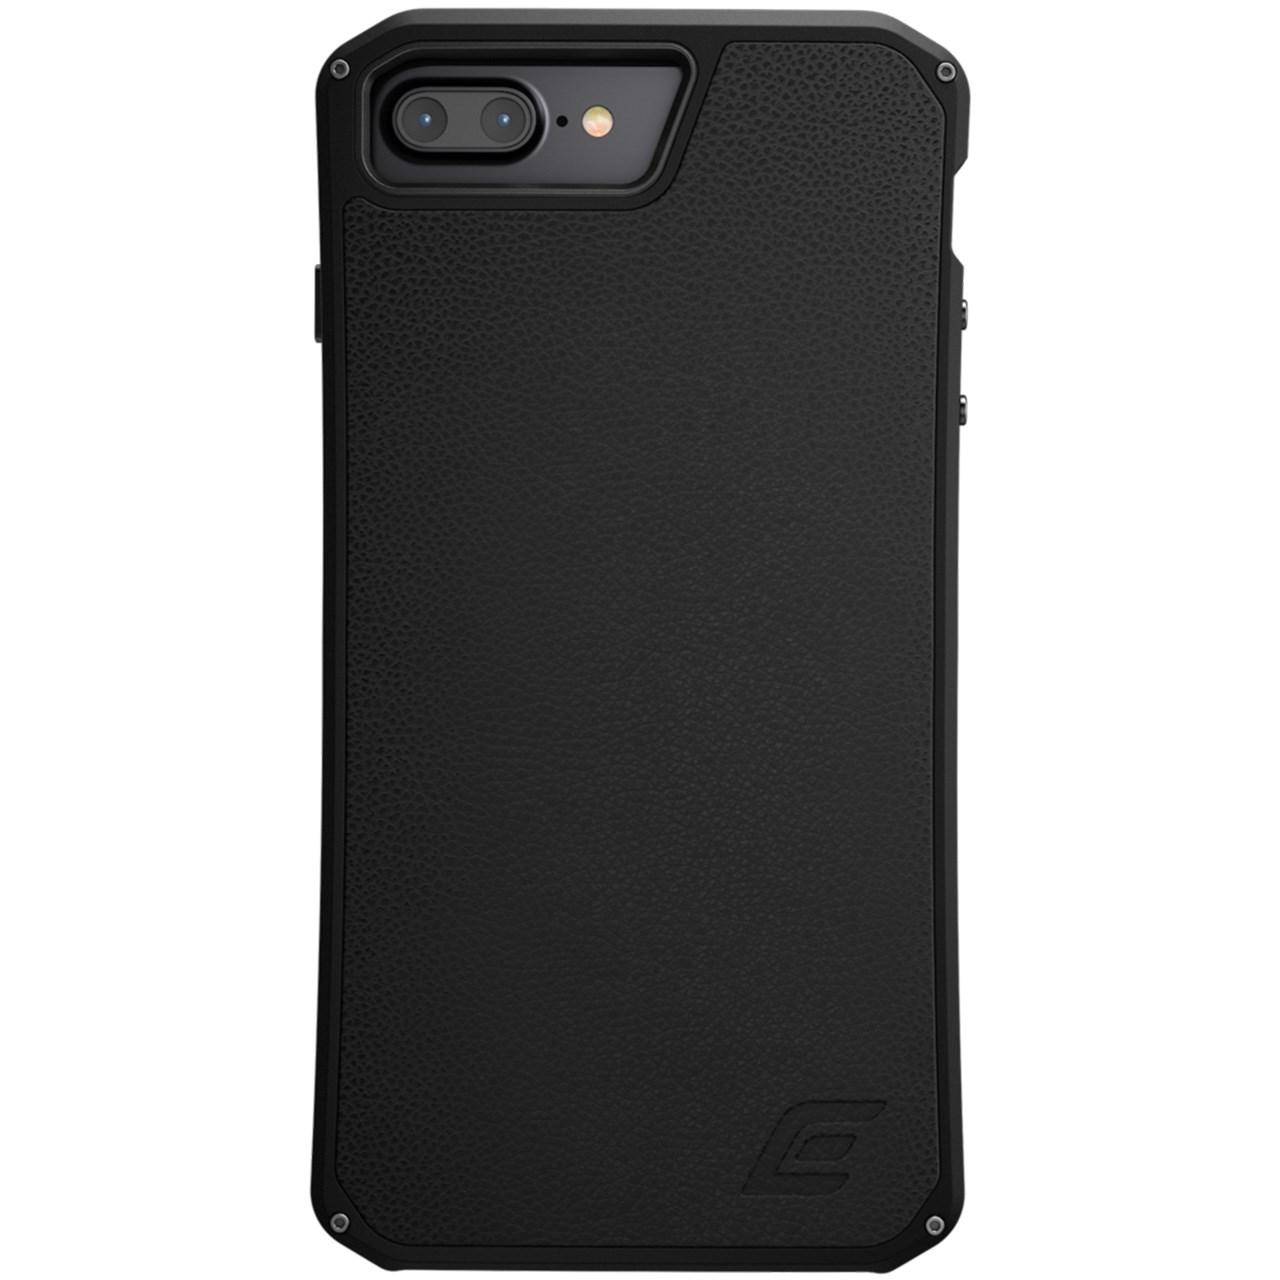 کاور المنت کیس مدل Solace LX مناسب برای گوشی موبایل آیفون 7 پلاس